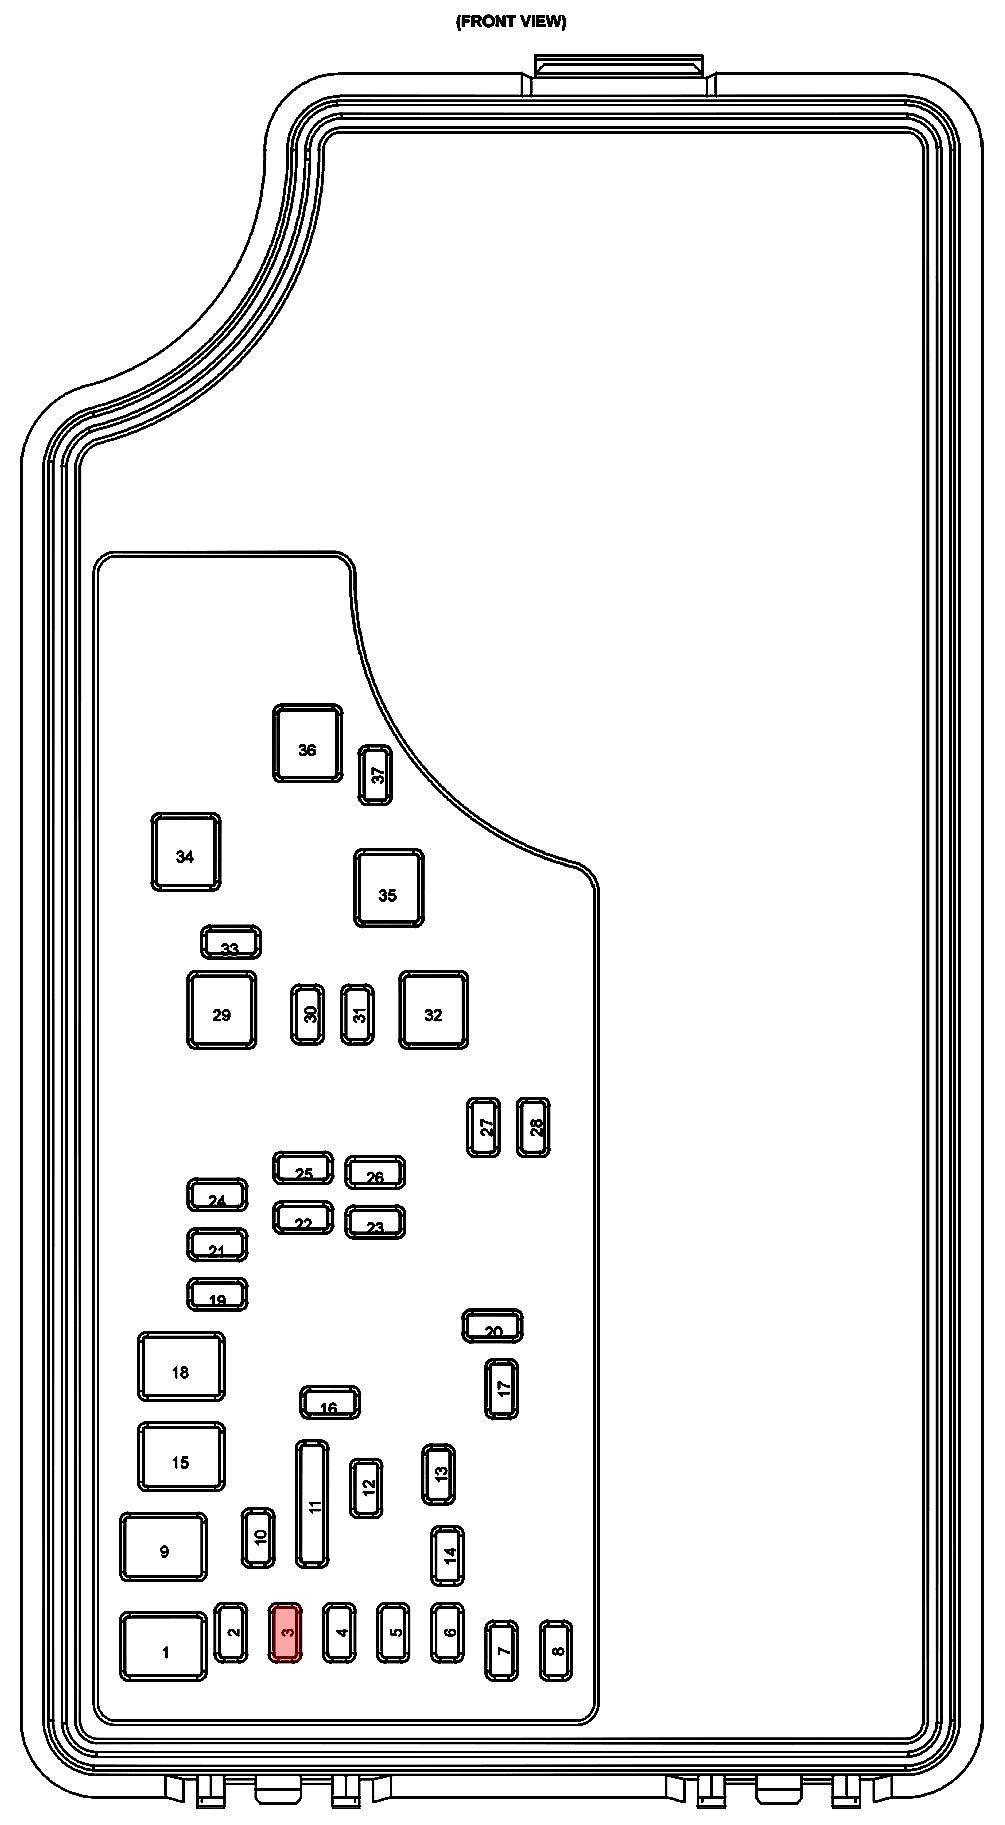 2003 Chrysler Sebring Fuse Box Diagram Wiring Diagram Reader B Reader B Saleebalocchi It